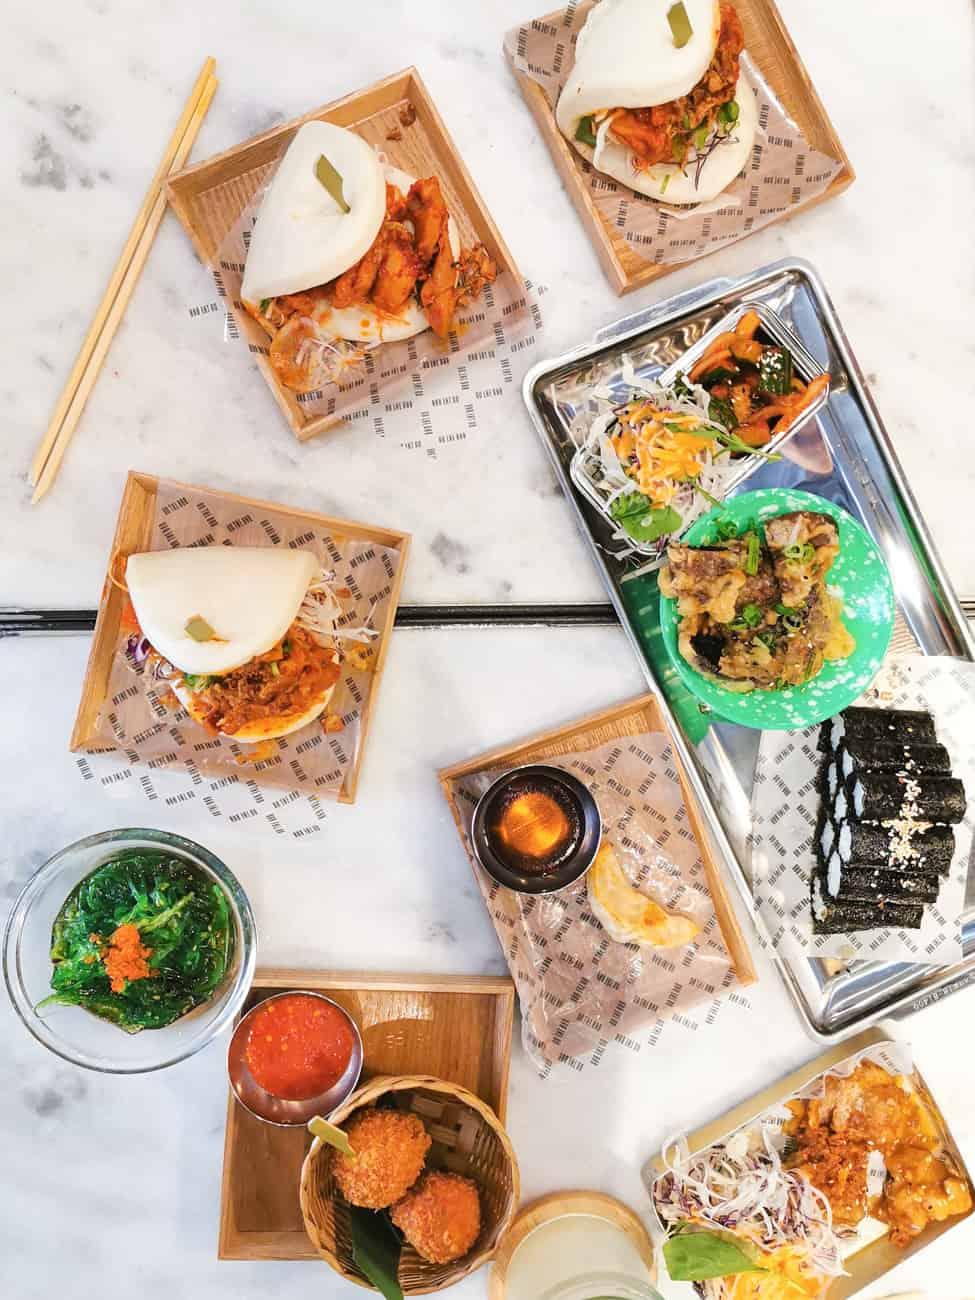 on-the-bab-paris-street-food-coreen-restaurant-14